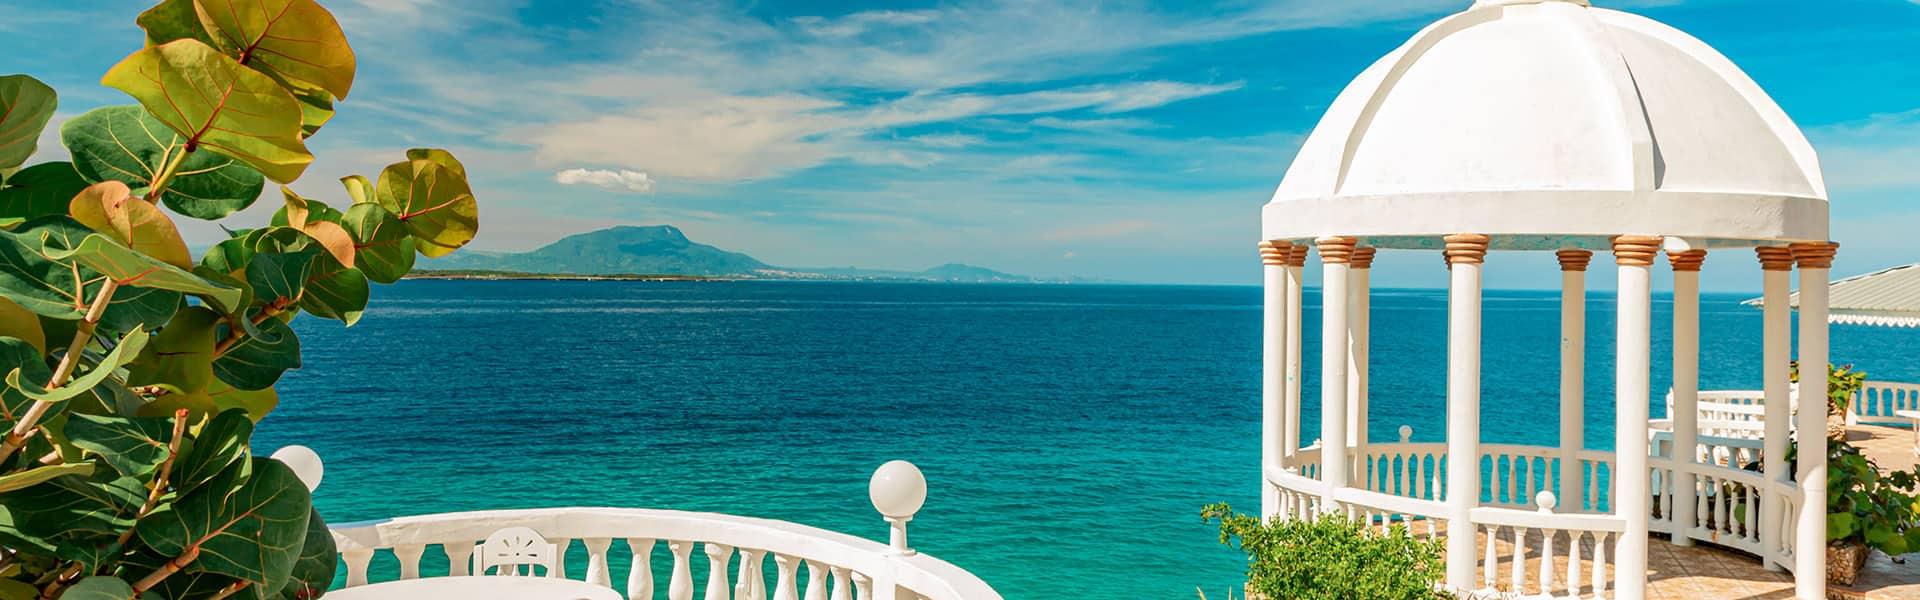 Caribbean: Great Stirrup Cay & Dominican Republic